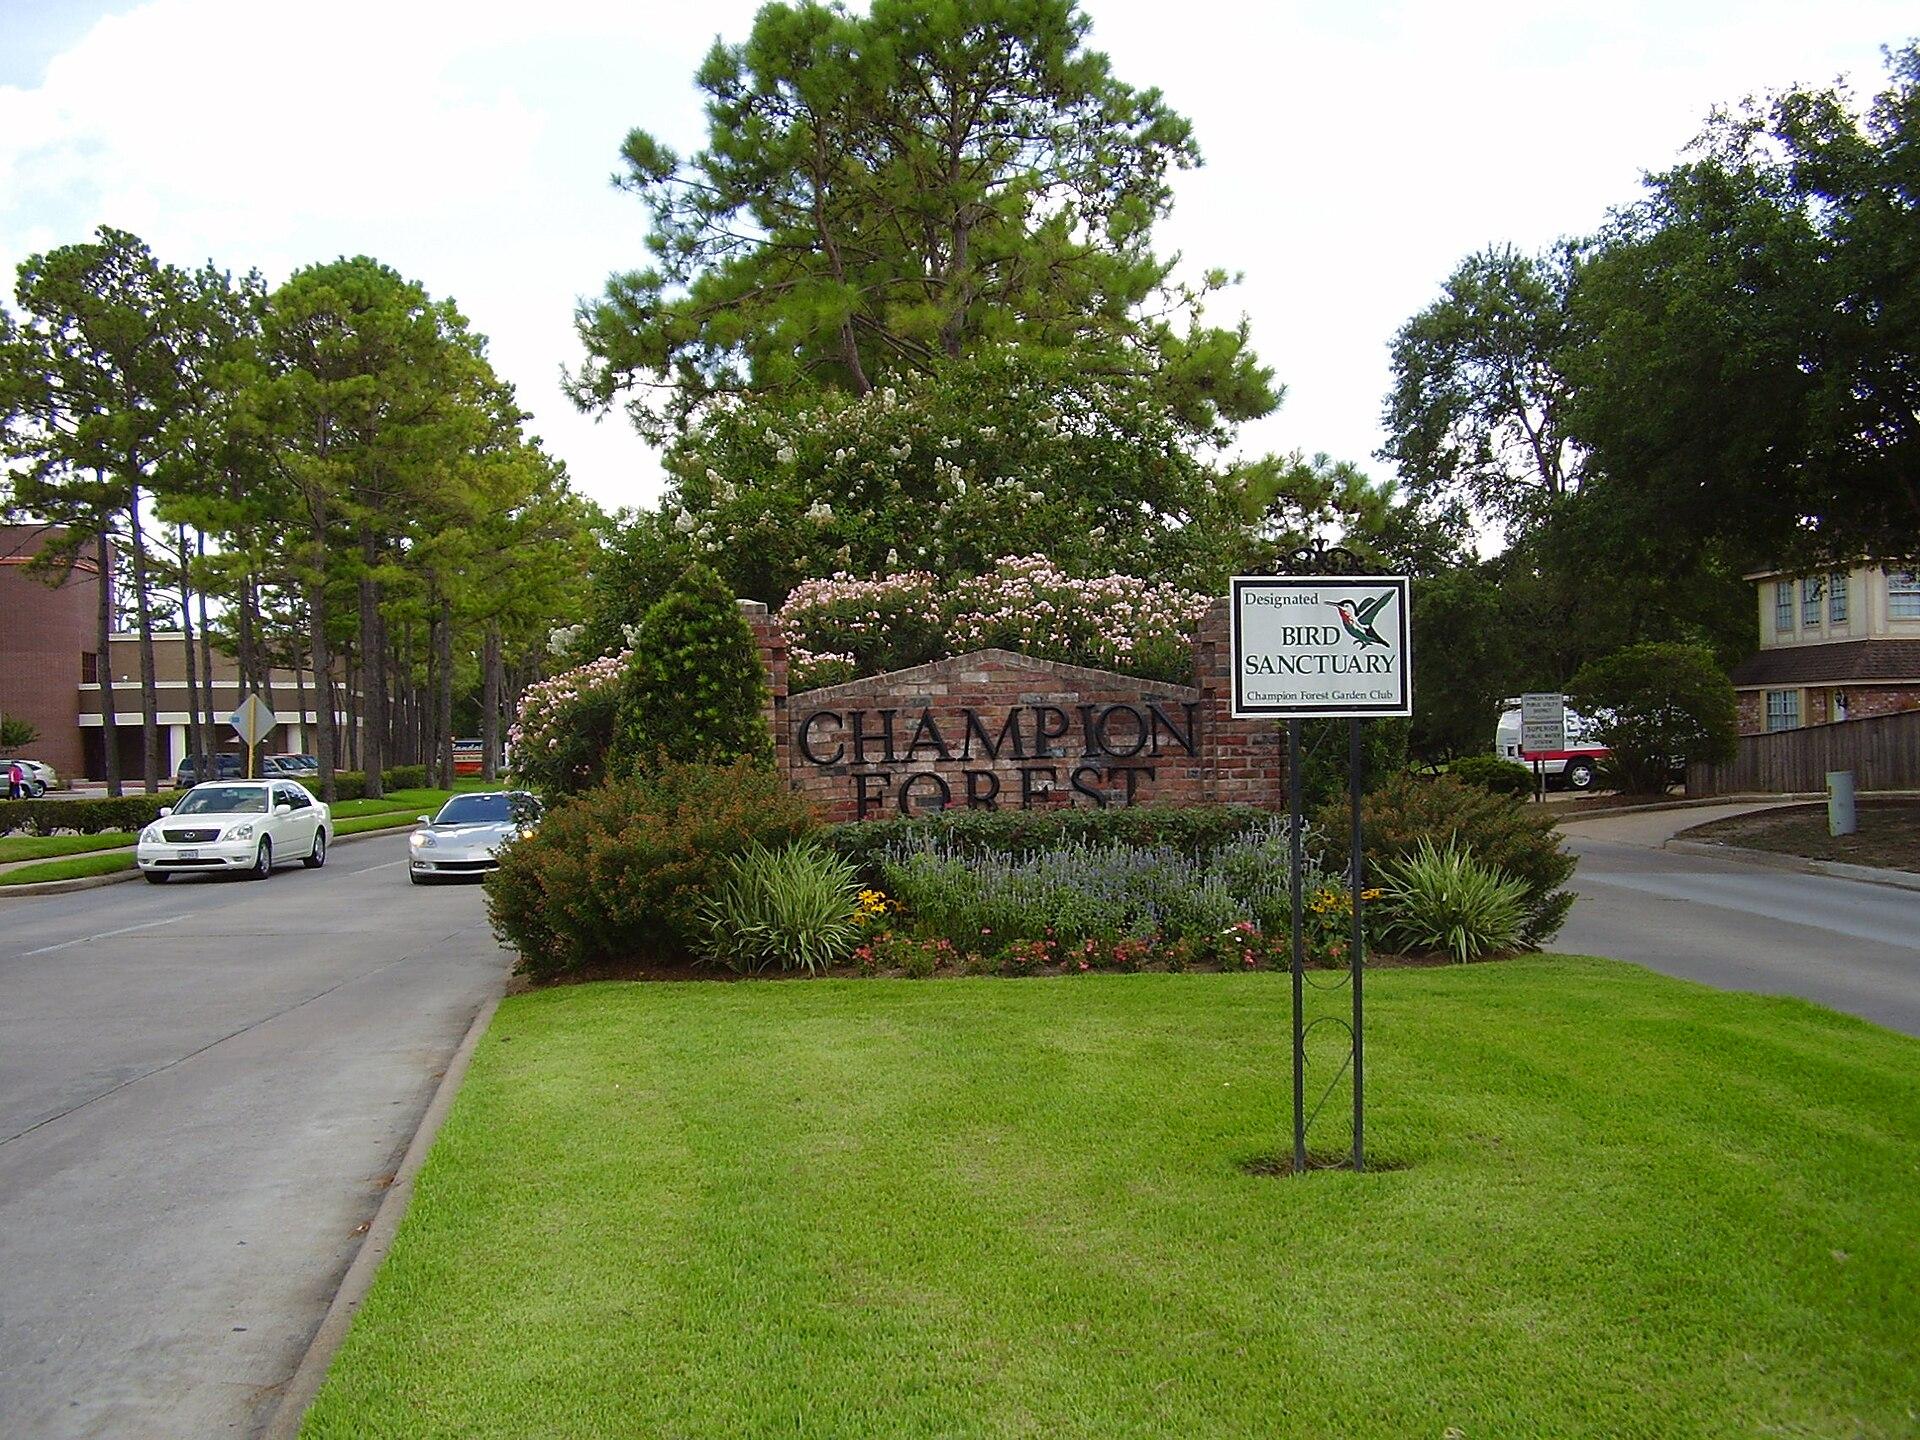 Harris County Property Tax Uber